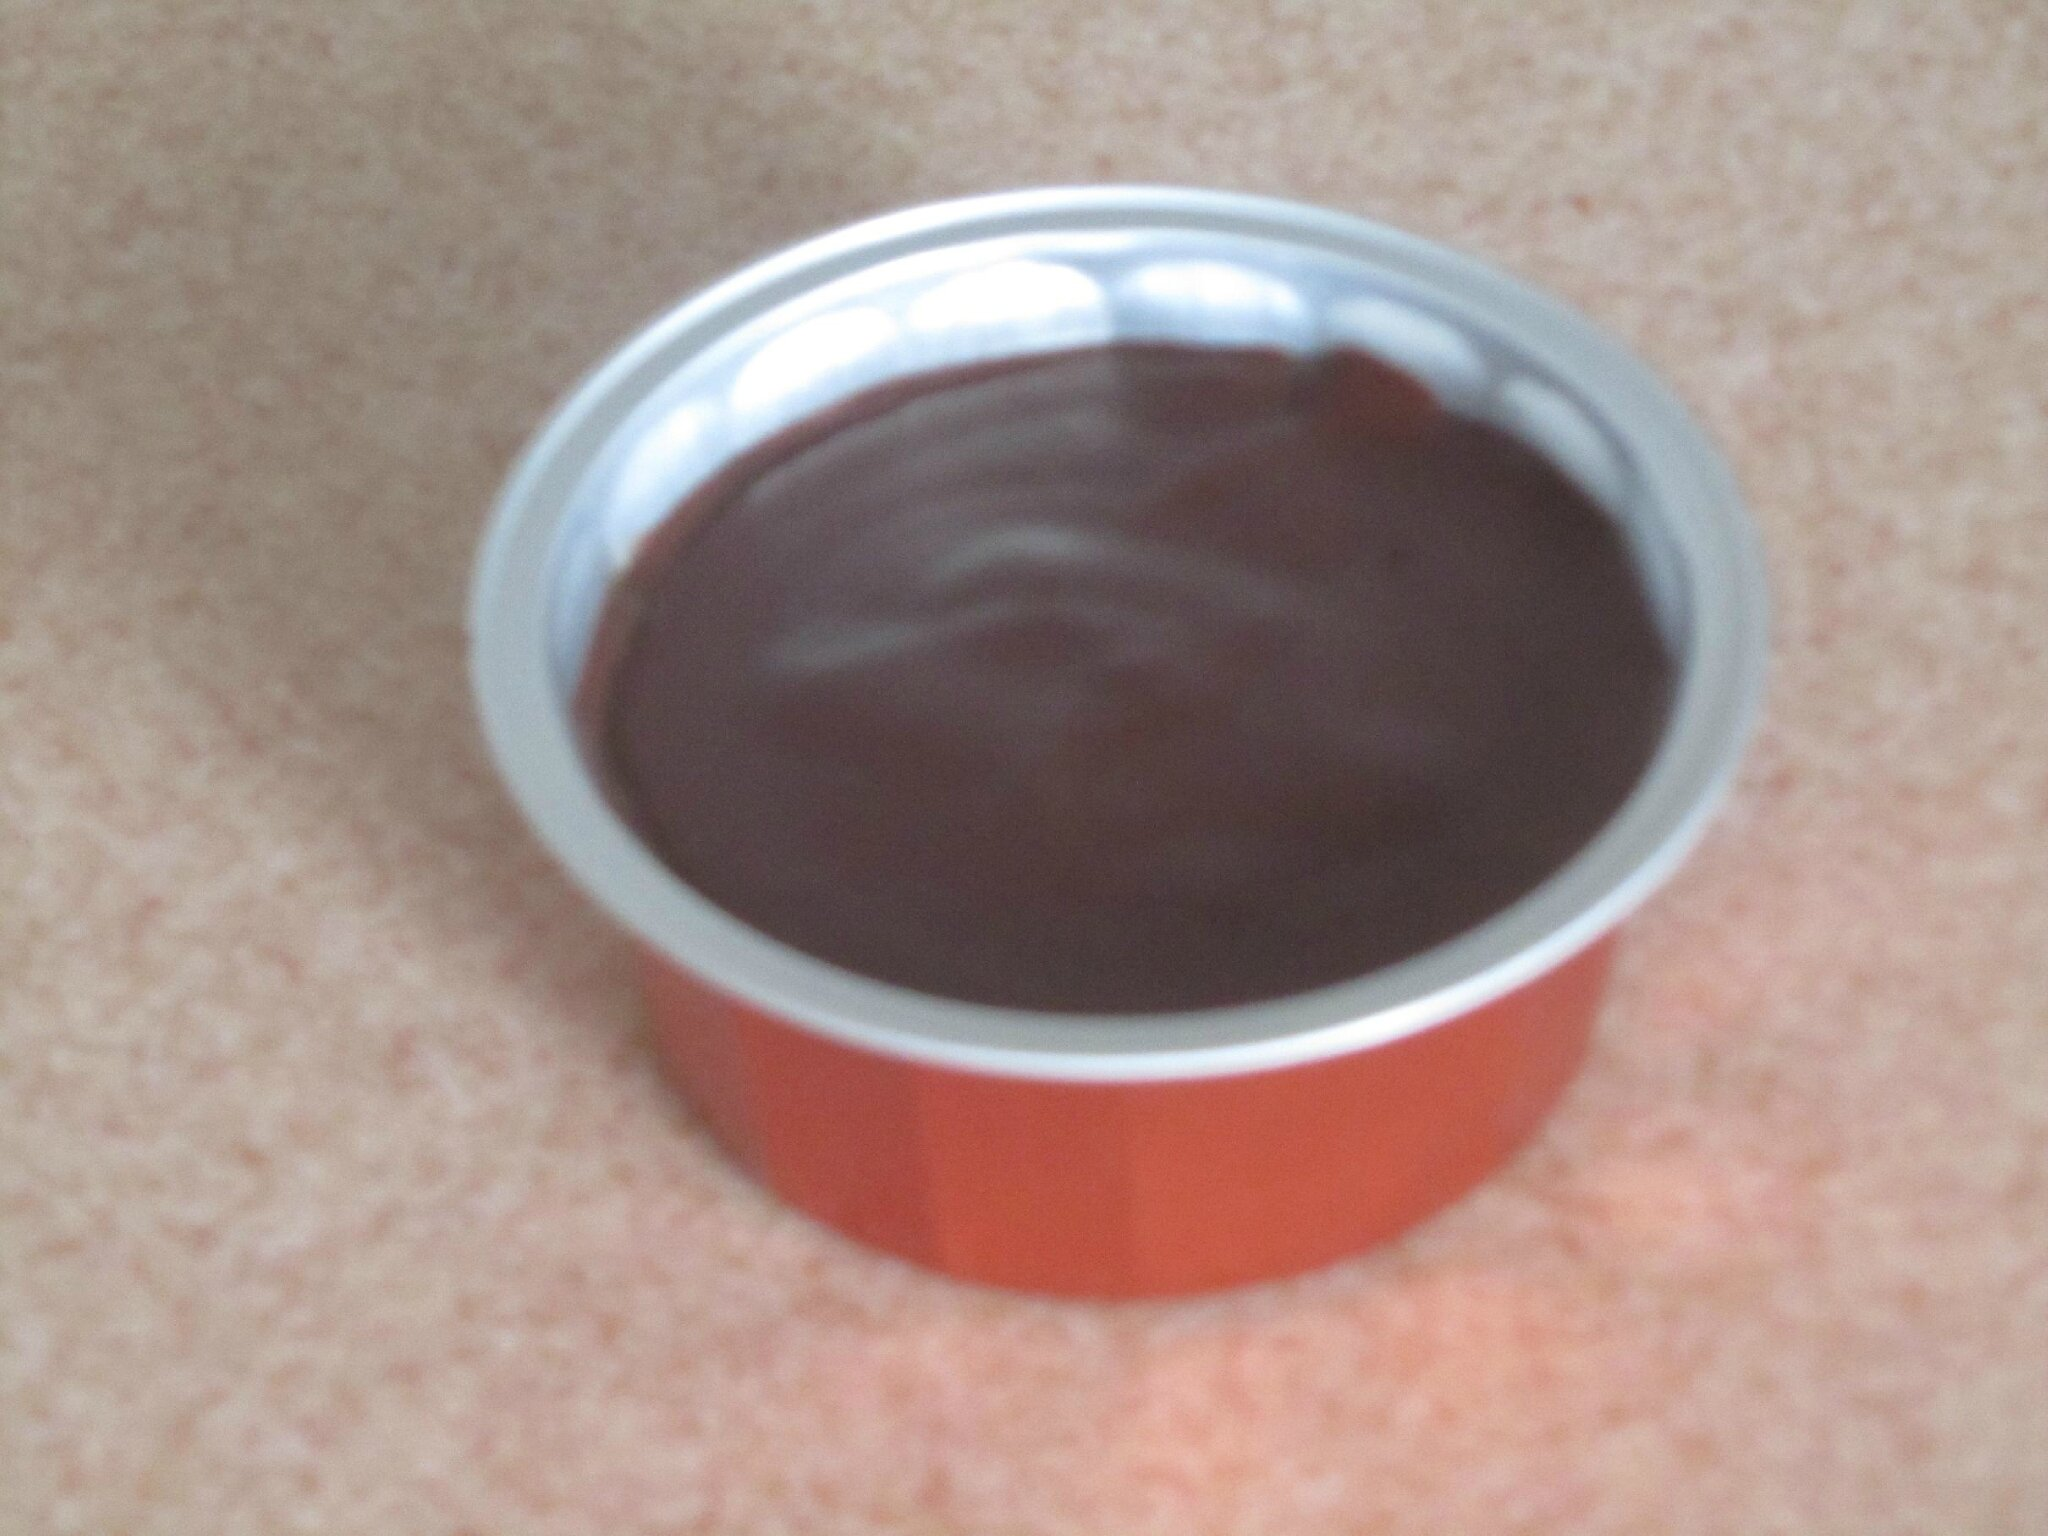 Cr me au chocolat maison fil 39 cr ations - Creme au chocolat maison ...